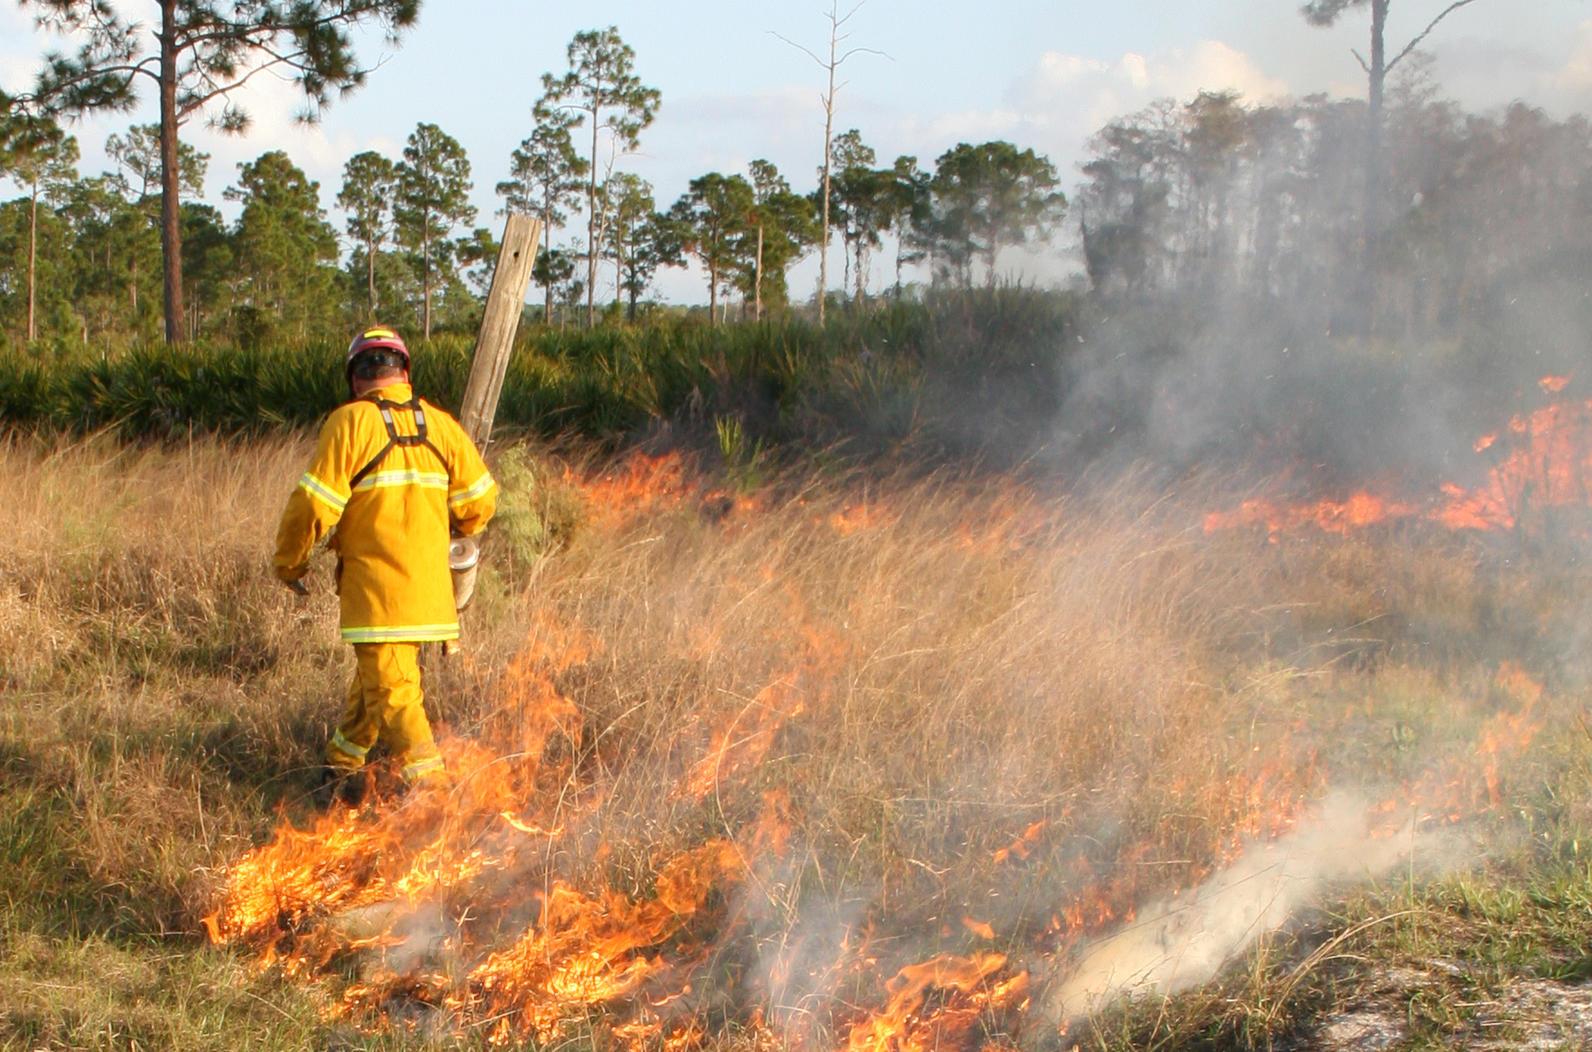 Conducting a prescribed burn at Audubon's Corkscrew Swamp Sanctuary